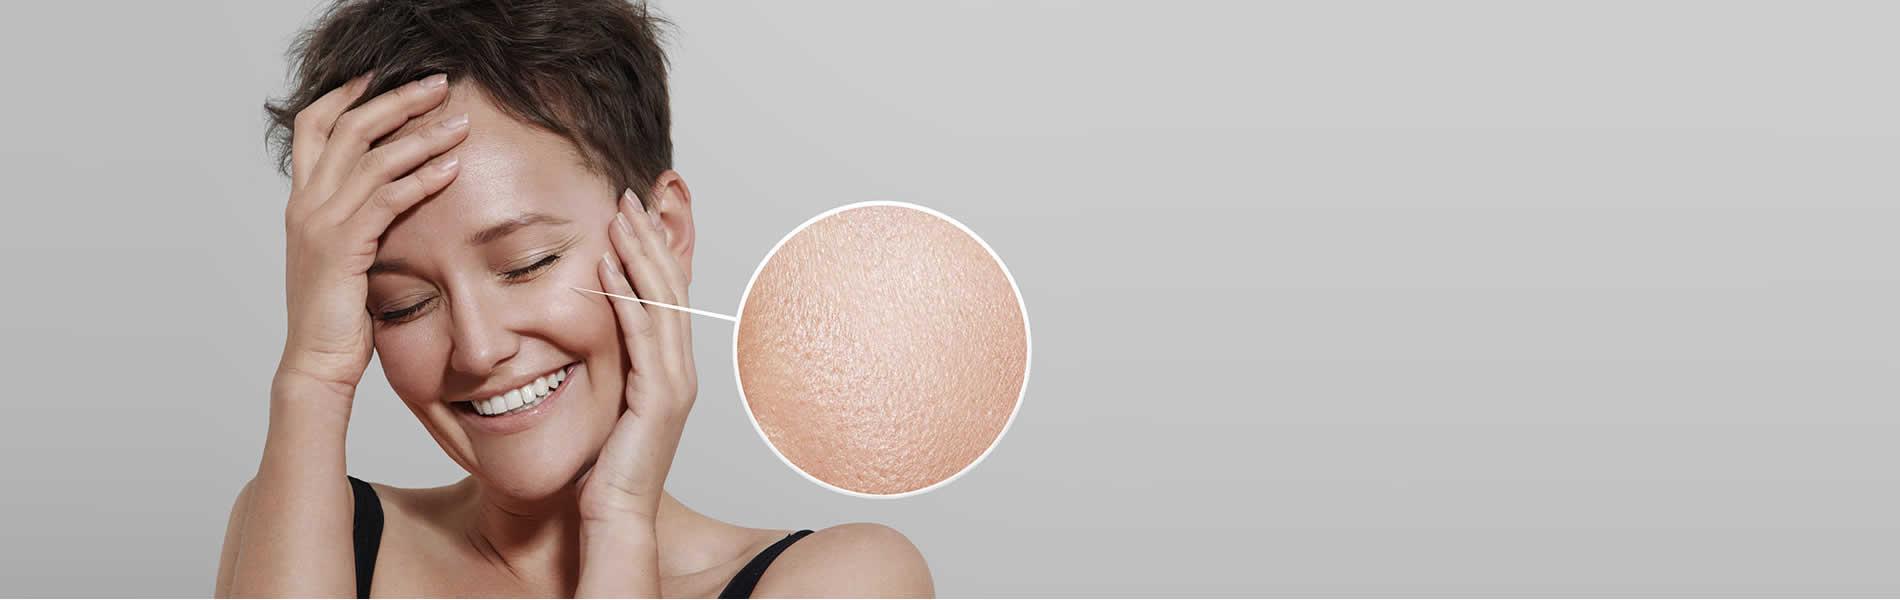 visage peau nette jeune - rajeunissement visage